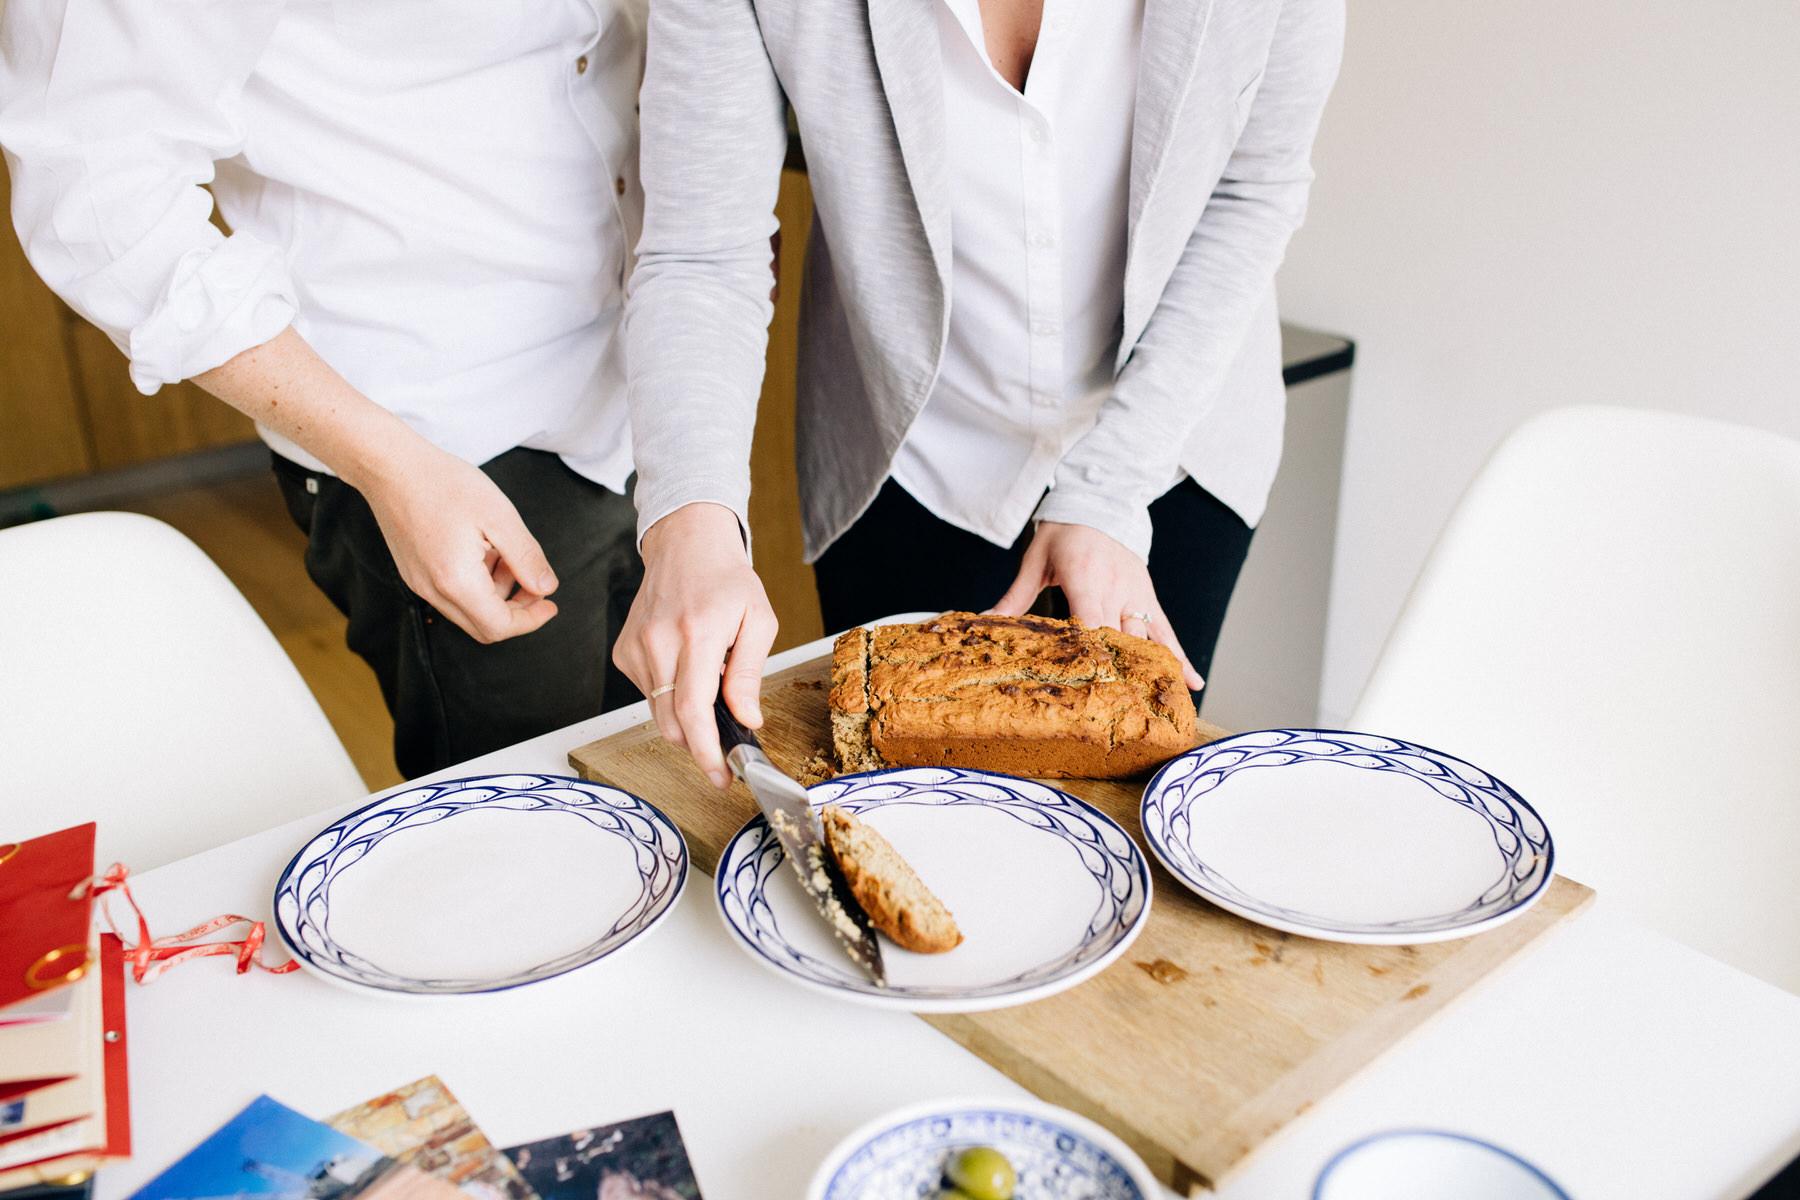 82 baking banana bread engagement session at home London.jpg